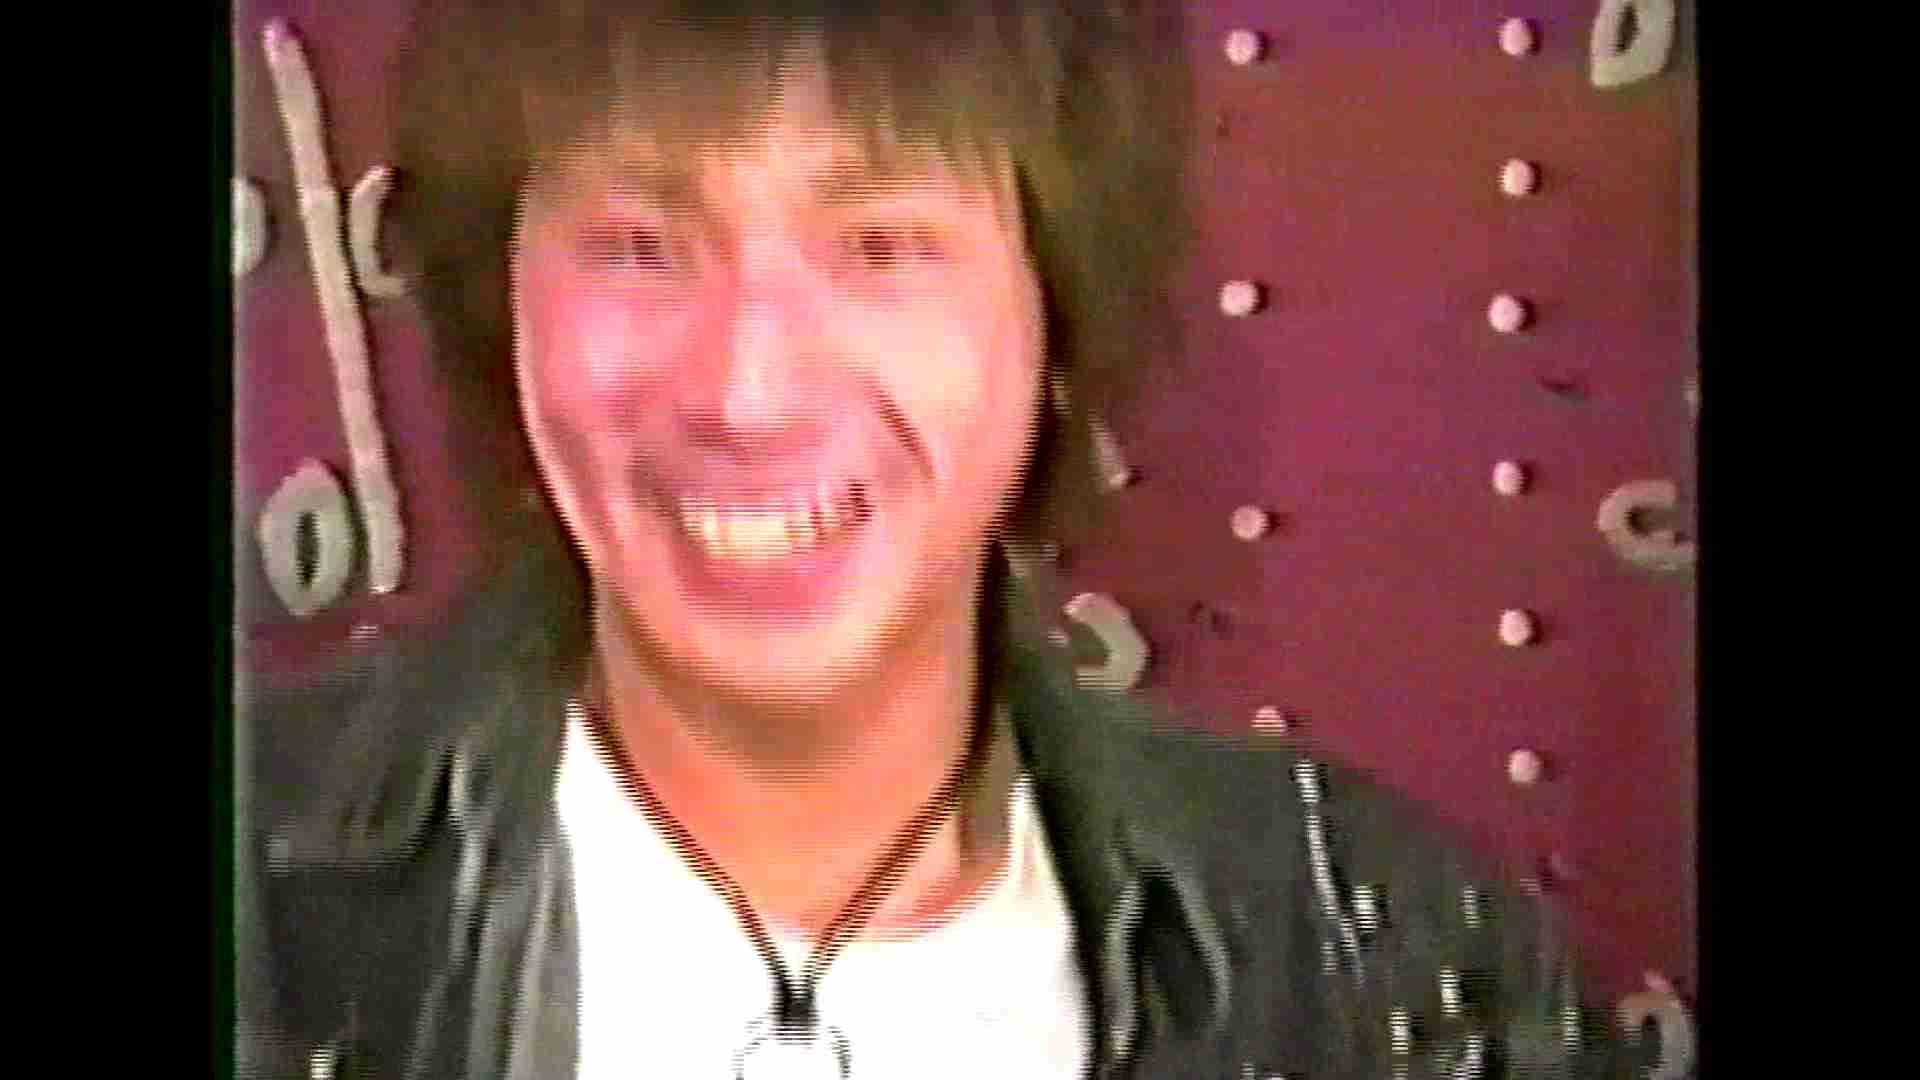 MADOKAさんのズリネタコレクションVol.3-1 名作・話題作 | オムニバス  101pic 27